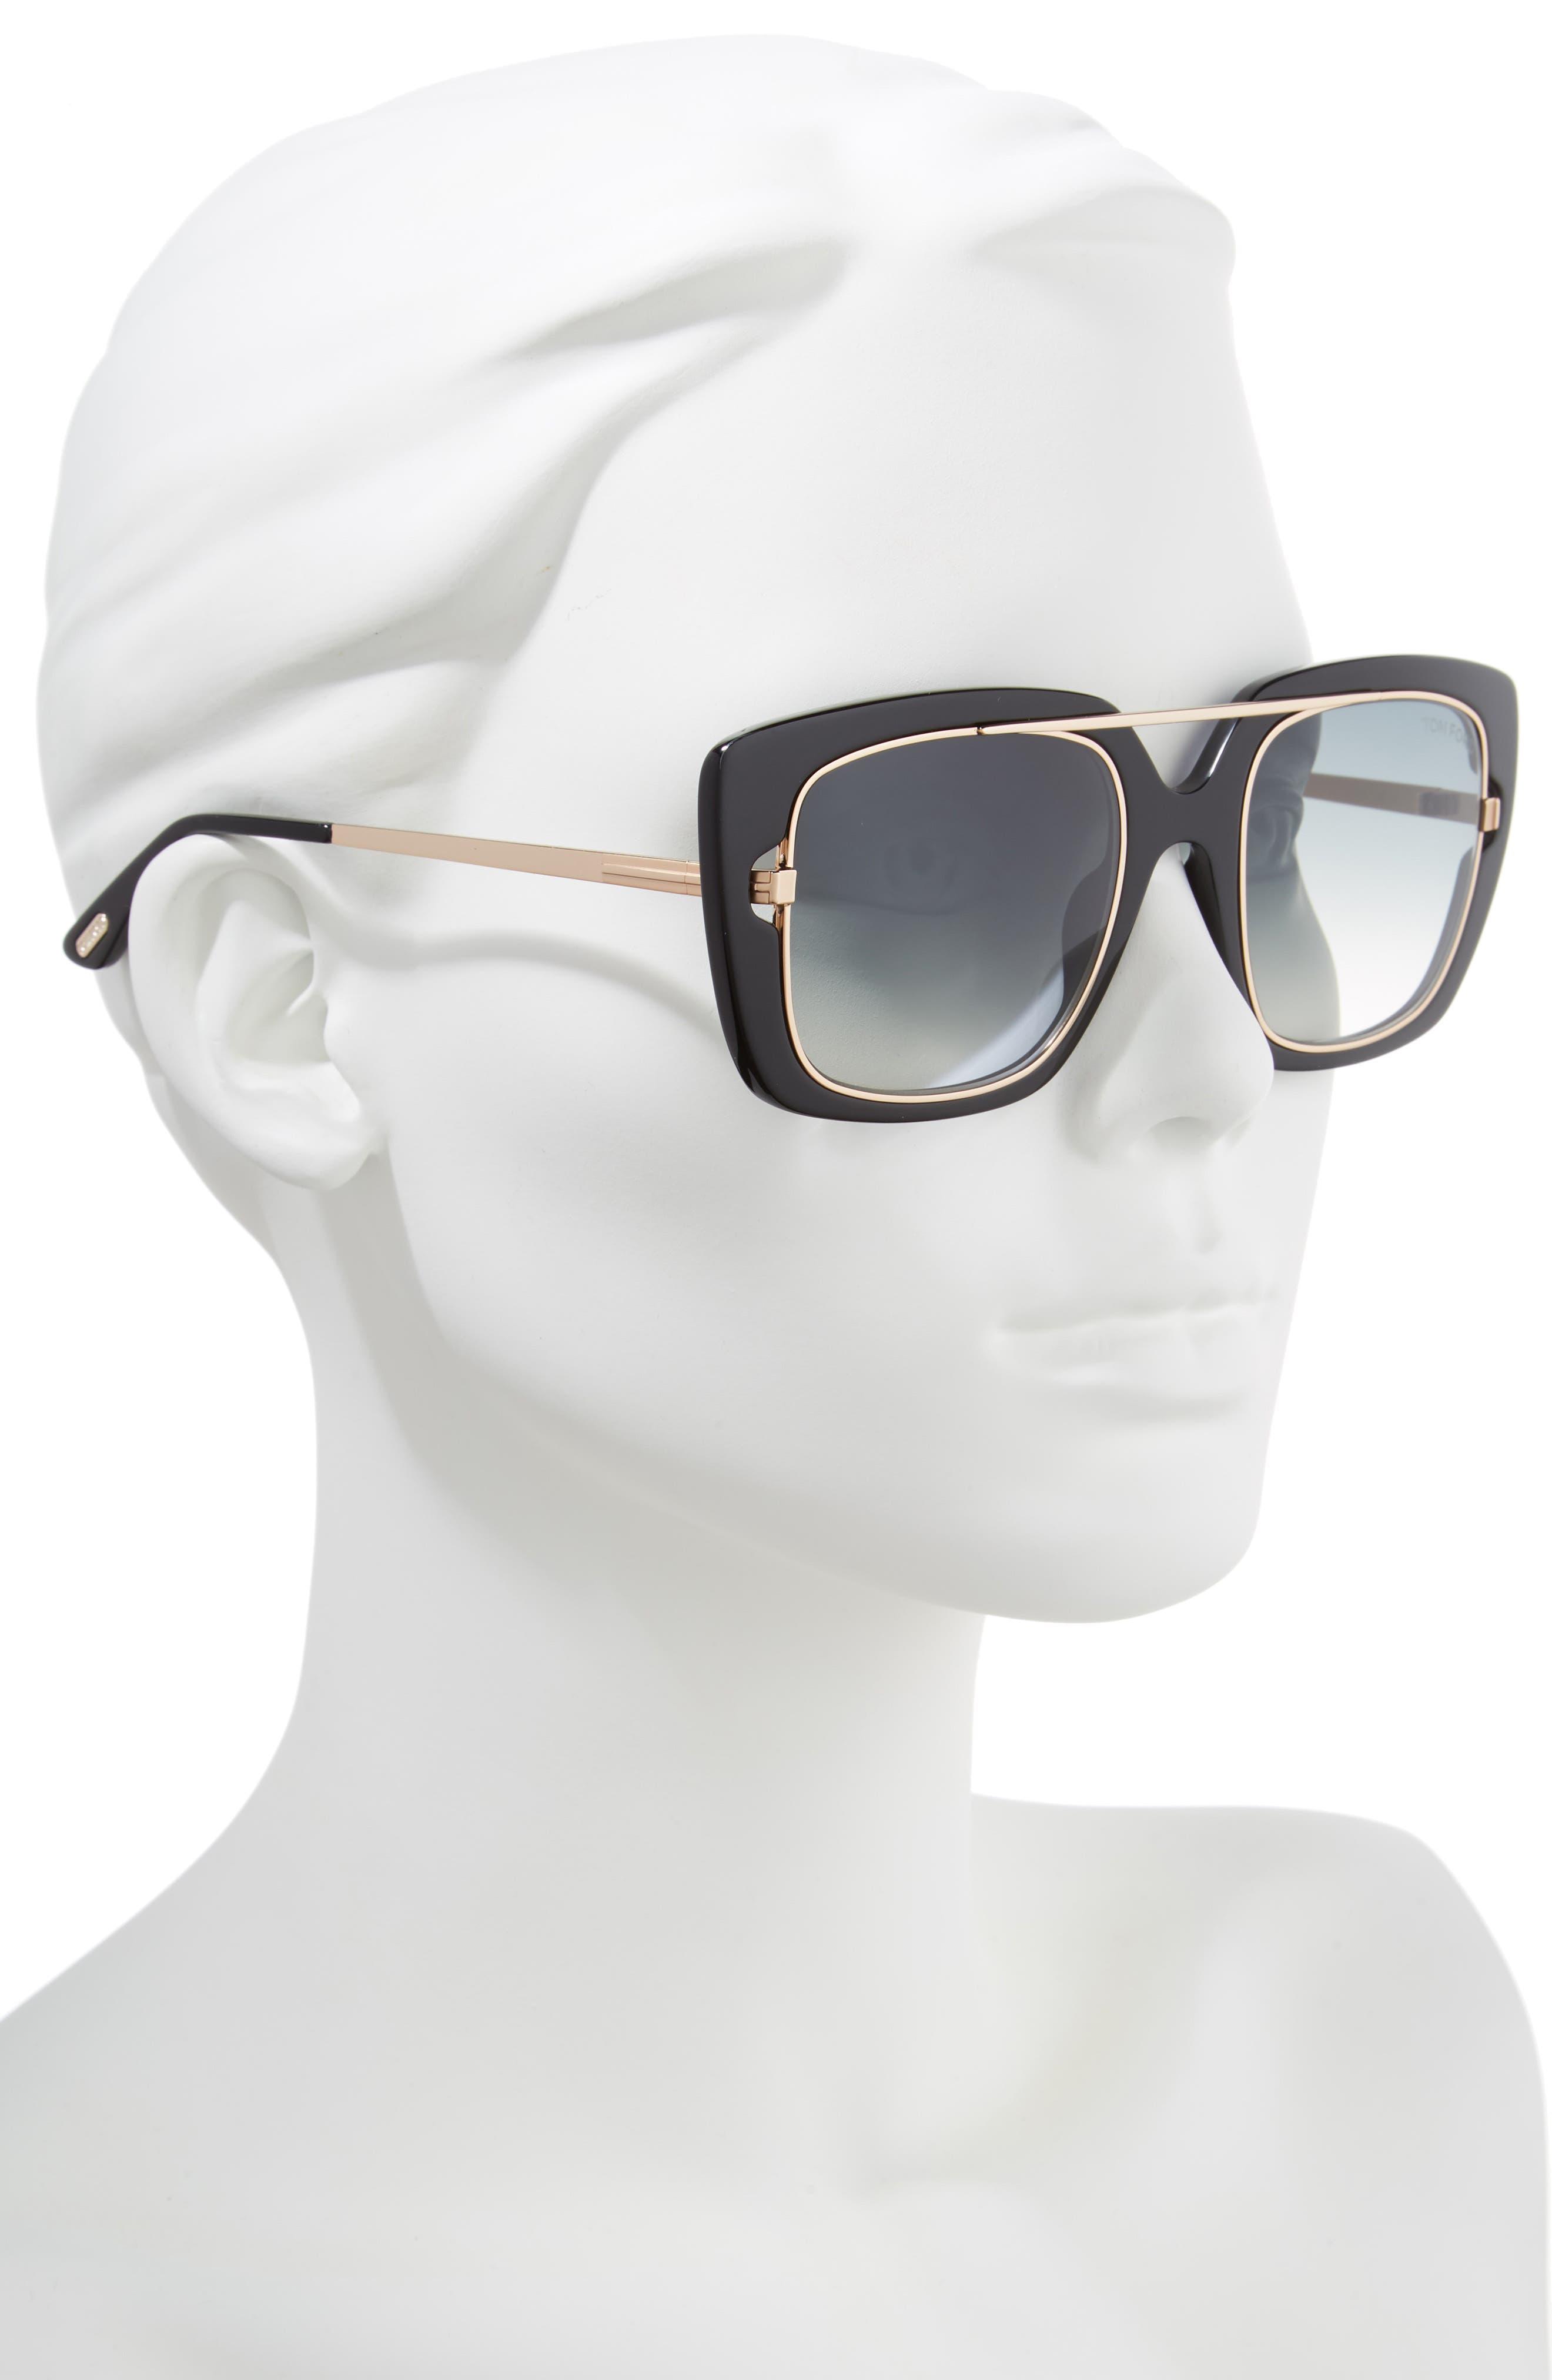 Marissa 52mm Sunglasses,                             Alternate thumbnail 2, color,                             Shiny Black/ Gradient Smoke